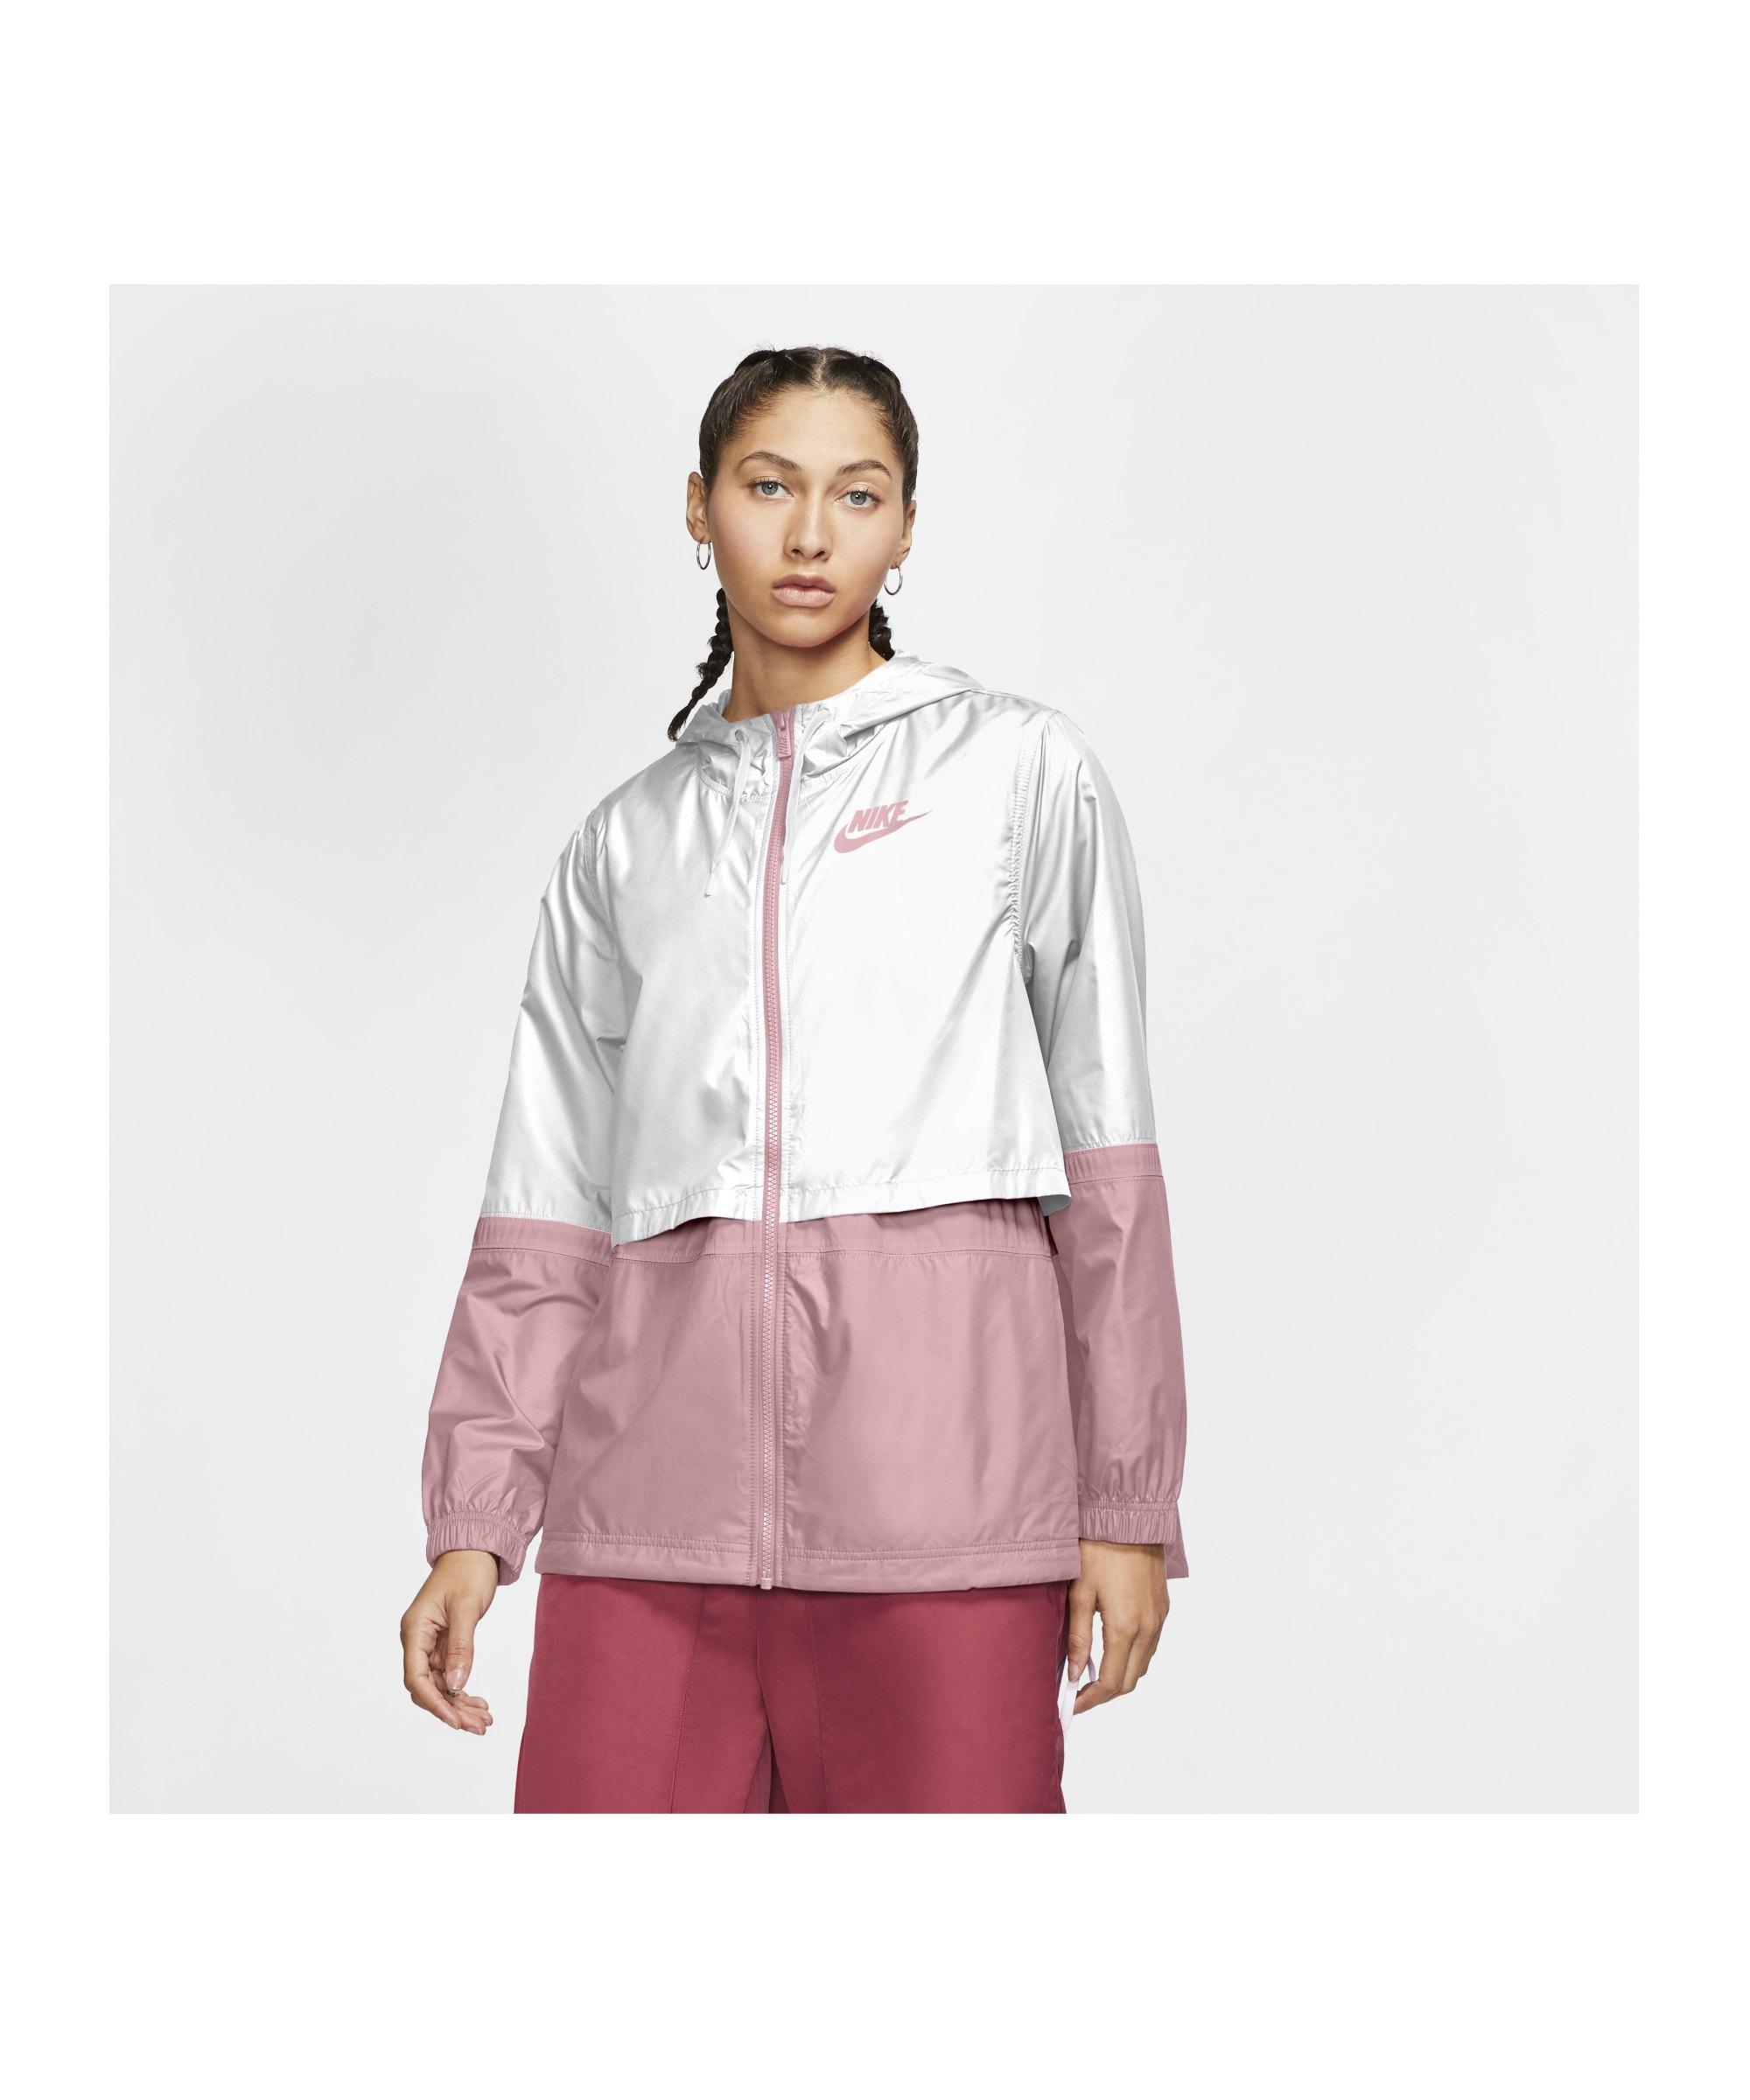 Nike Woven Jacke Damen Weiss Pink F109 - weiss